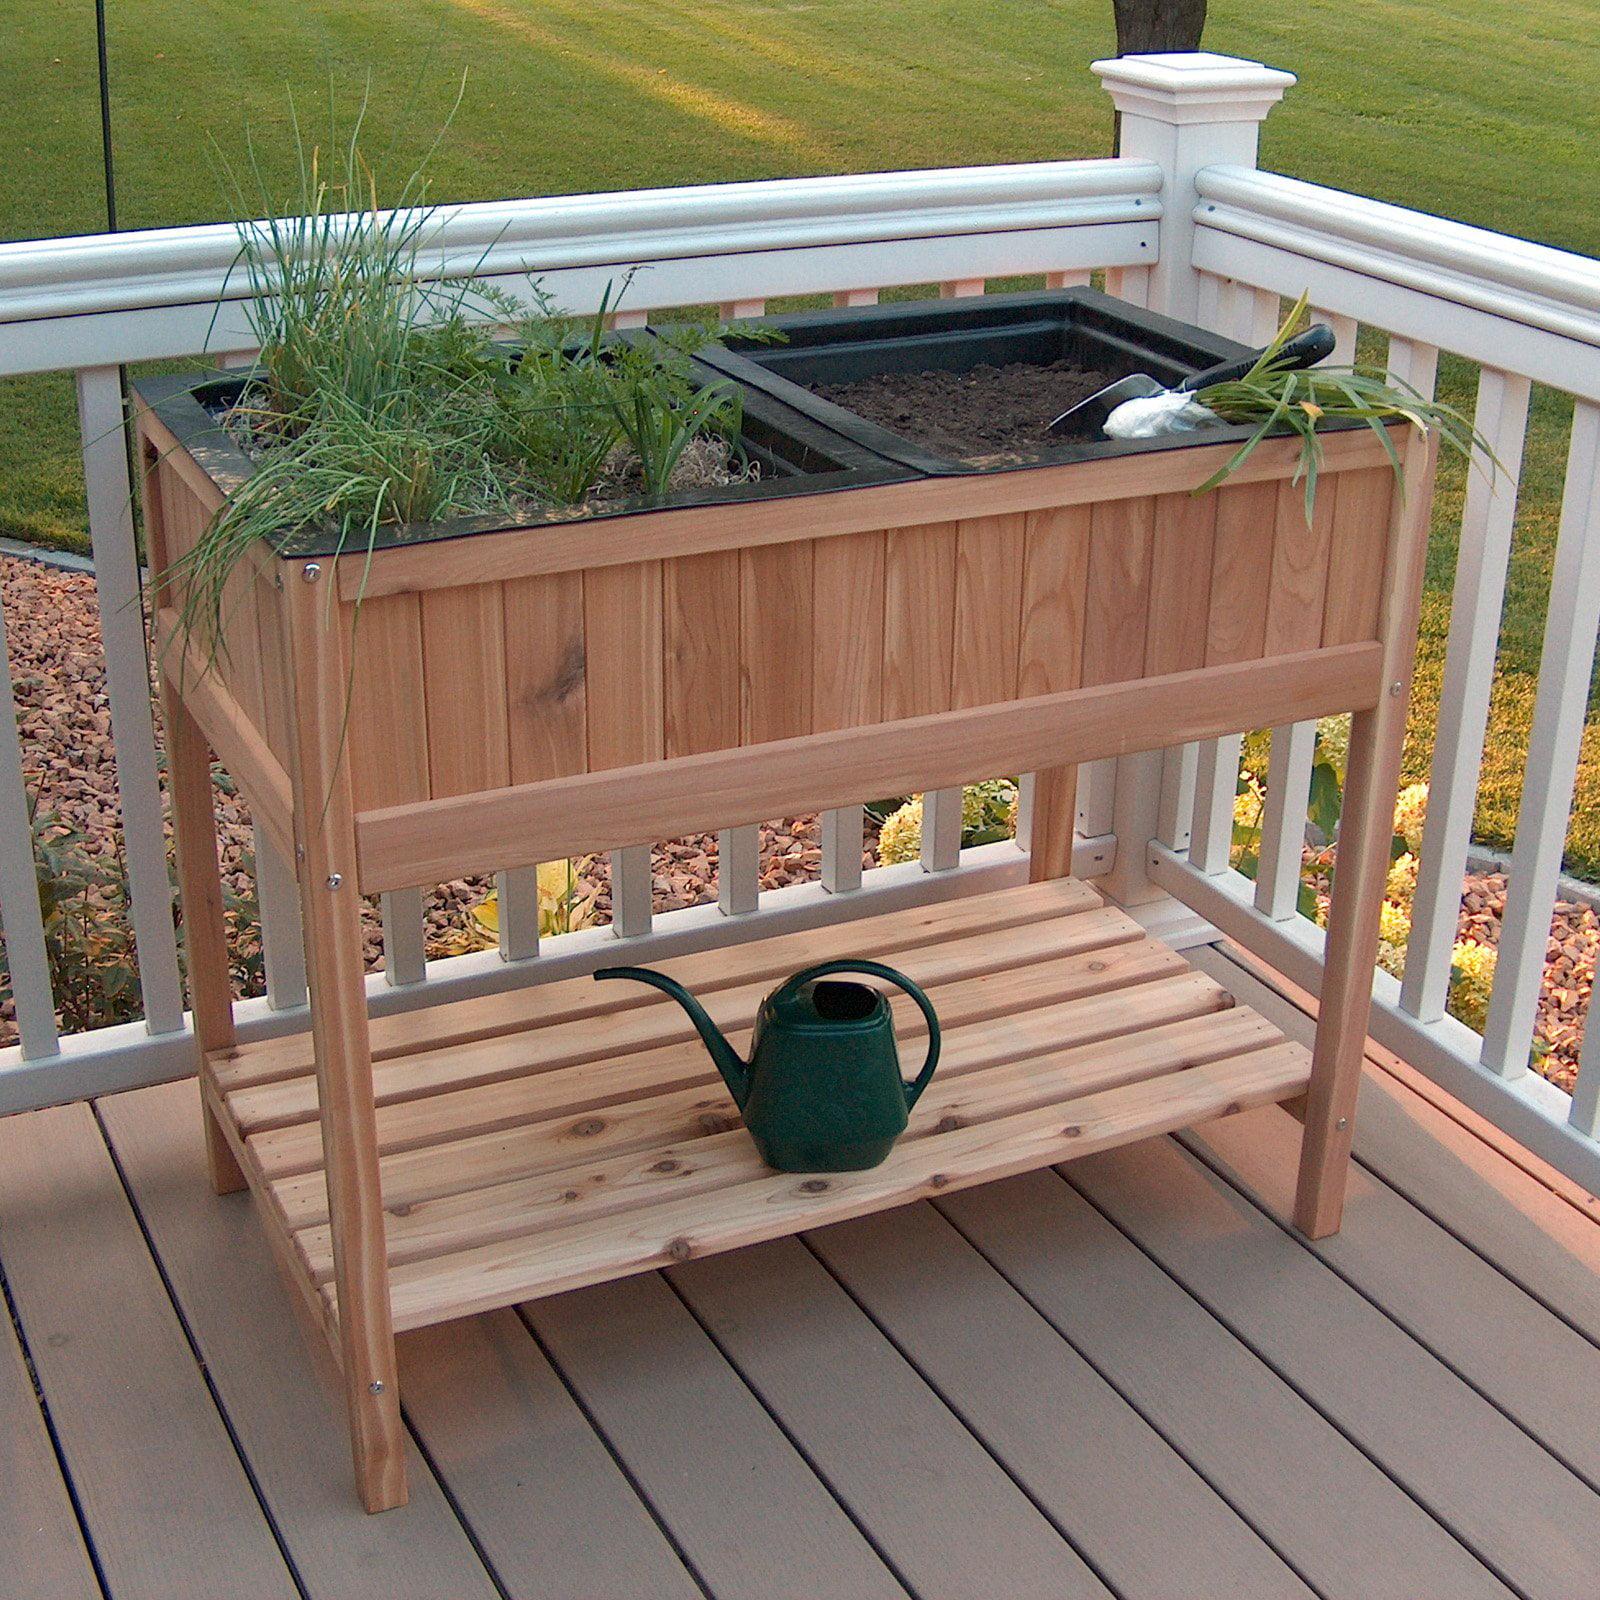 Amish Wagon Decorative Indoor / Outdoor Garden Backyard Planter, Green    Walmart.com